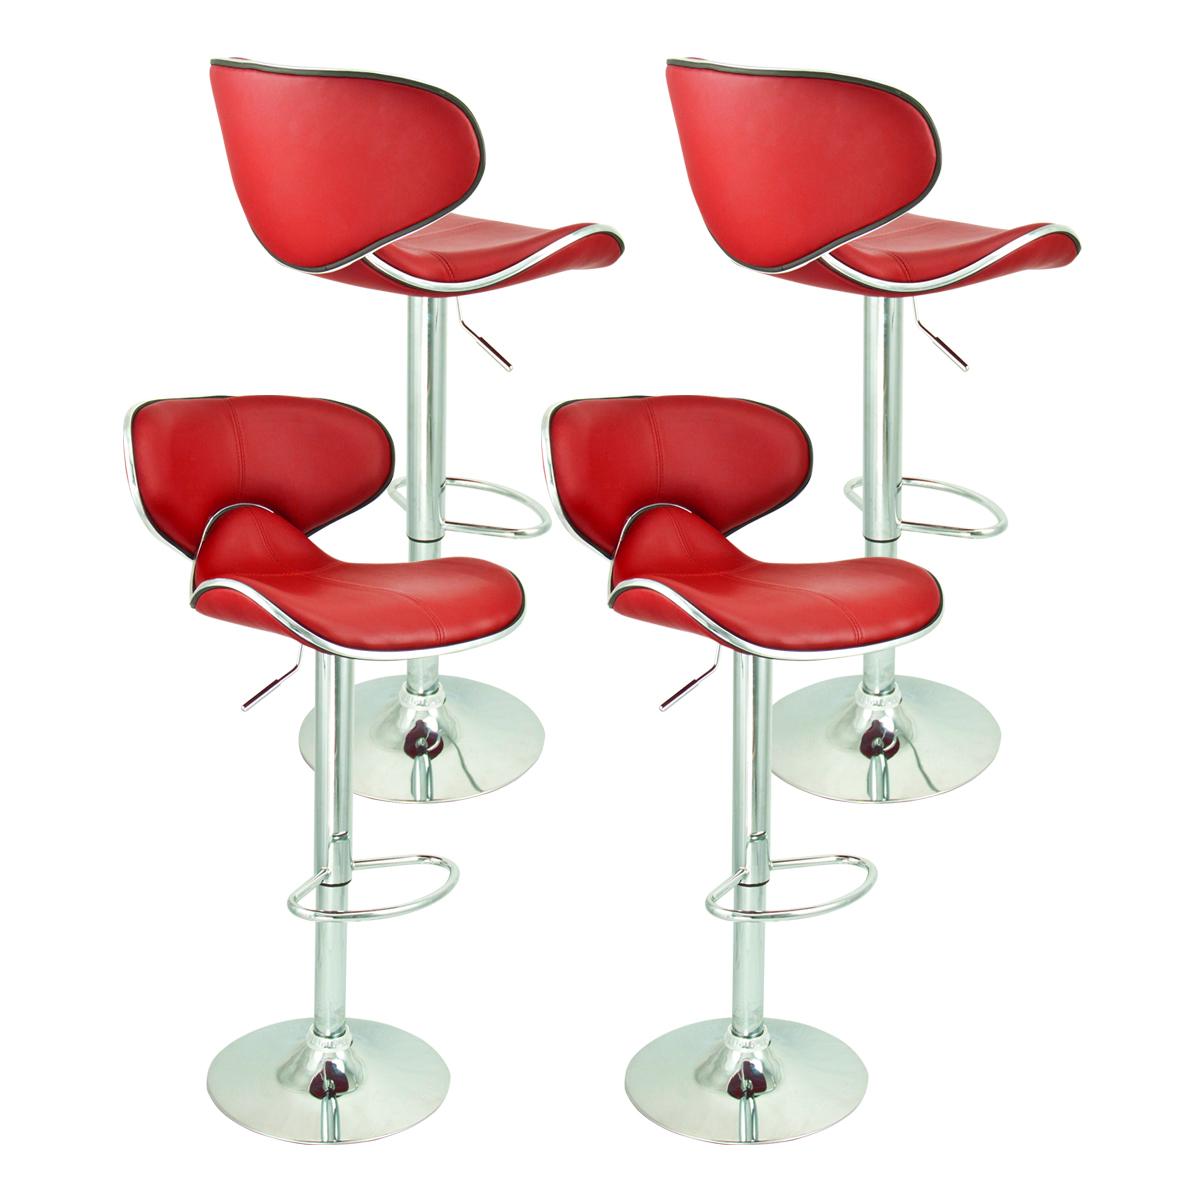 4 Swivel Red Bar Stool Elegant PU Leather Modern  : 37851ah from ebay.com size 1200 x 1200 jpeg 468kB